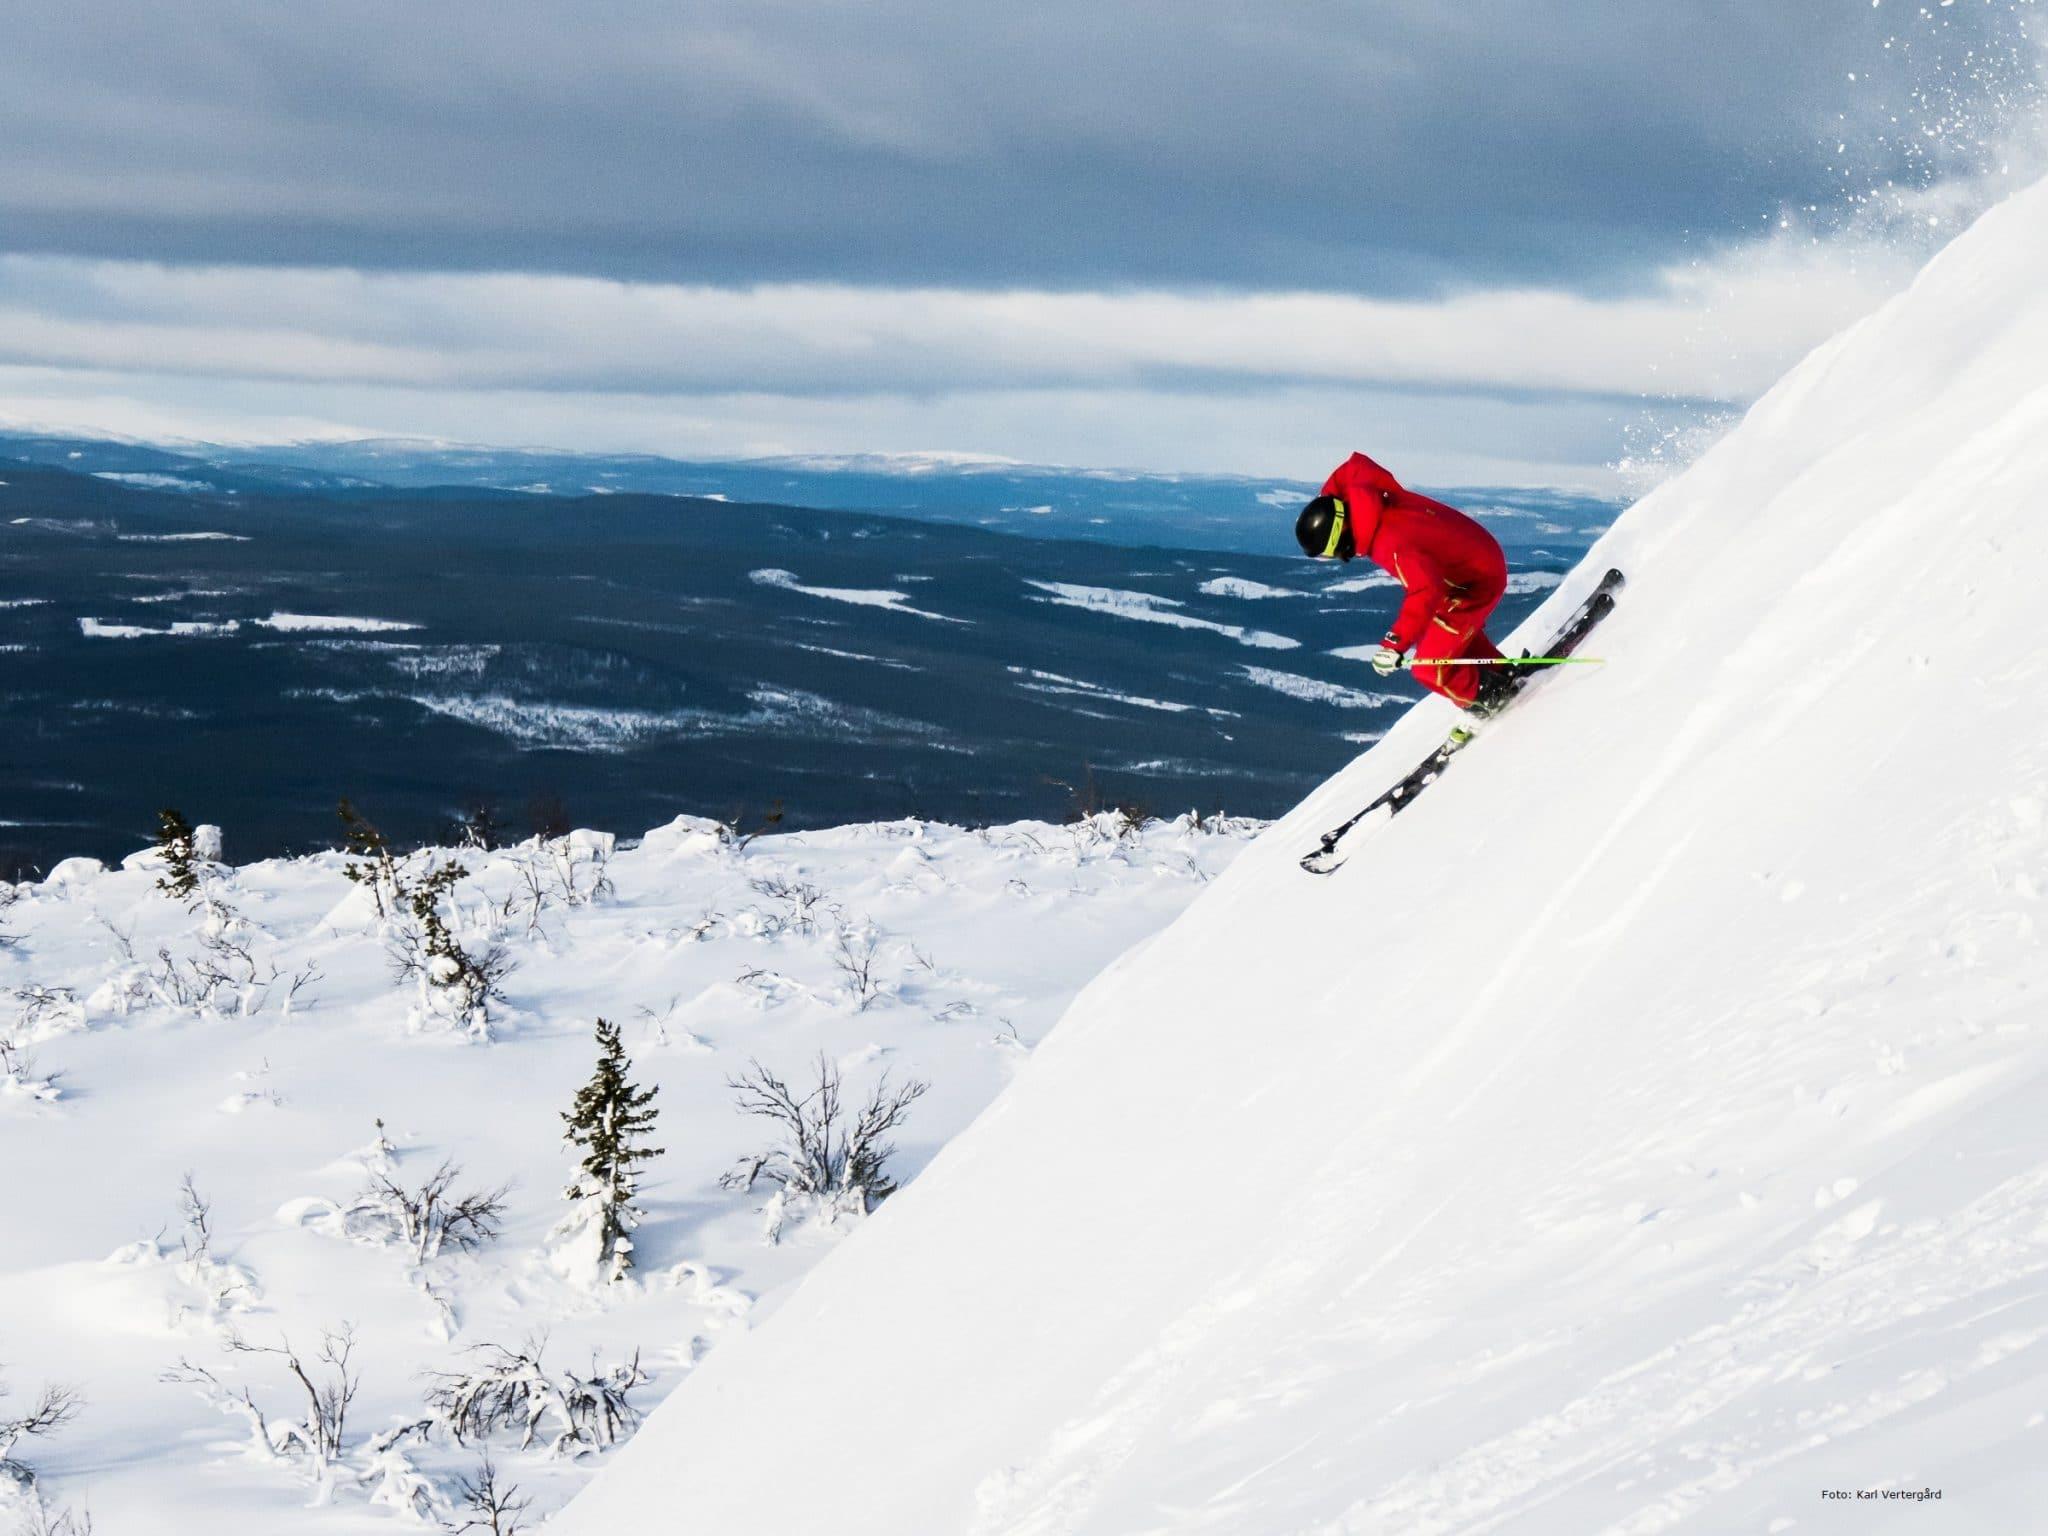 Skier in steep hill